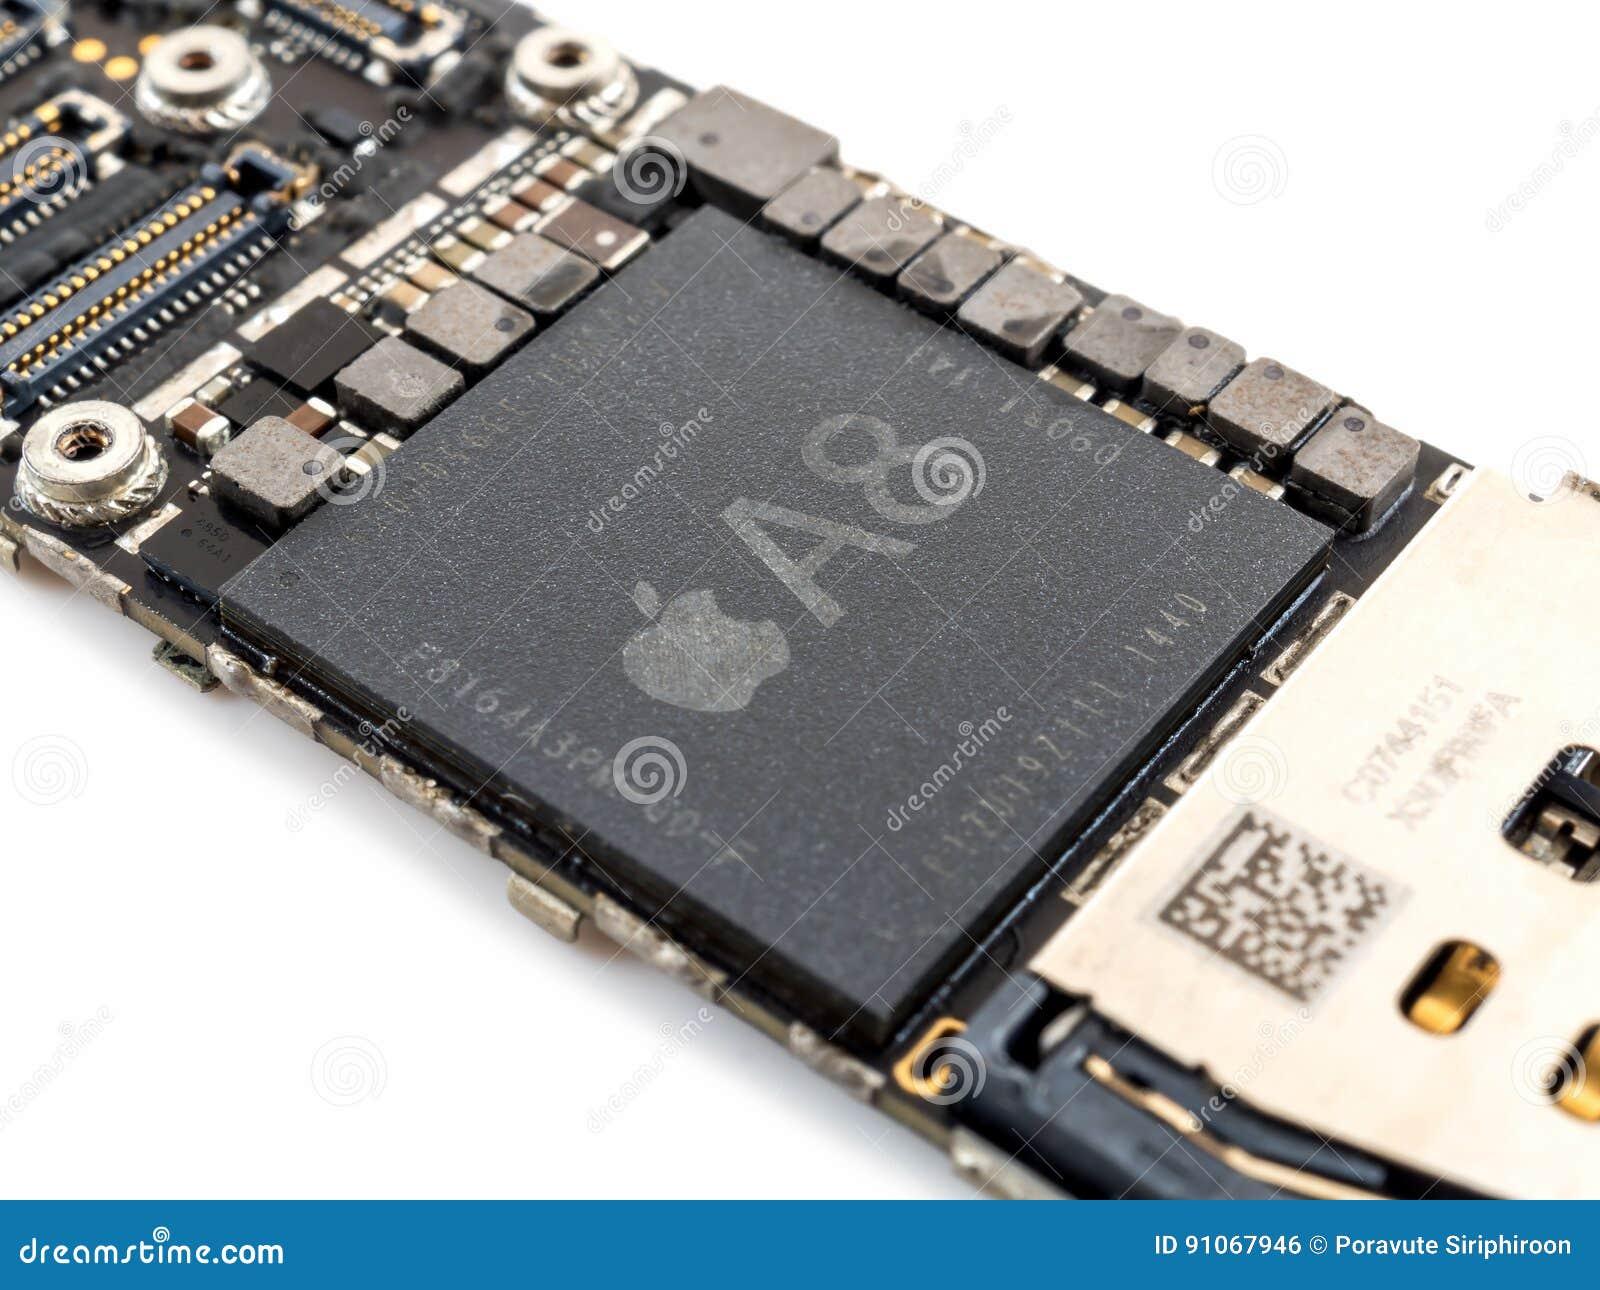 Apple iPhone 6 CPU IC chip